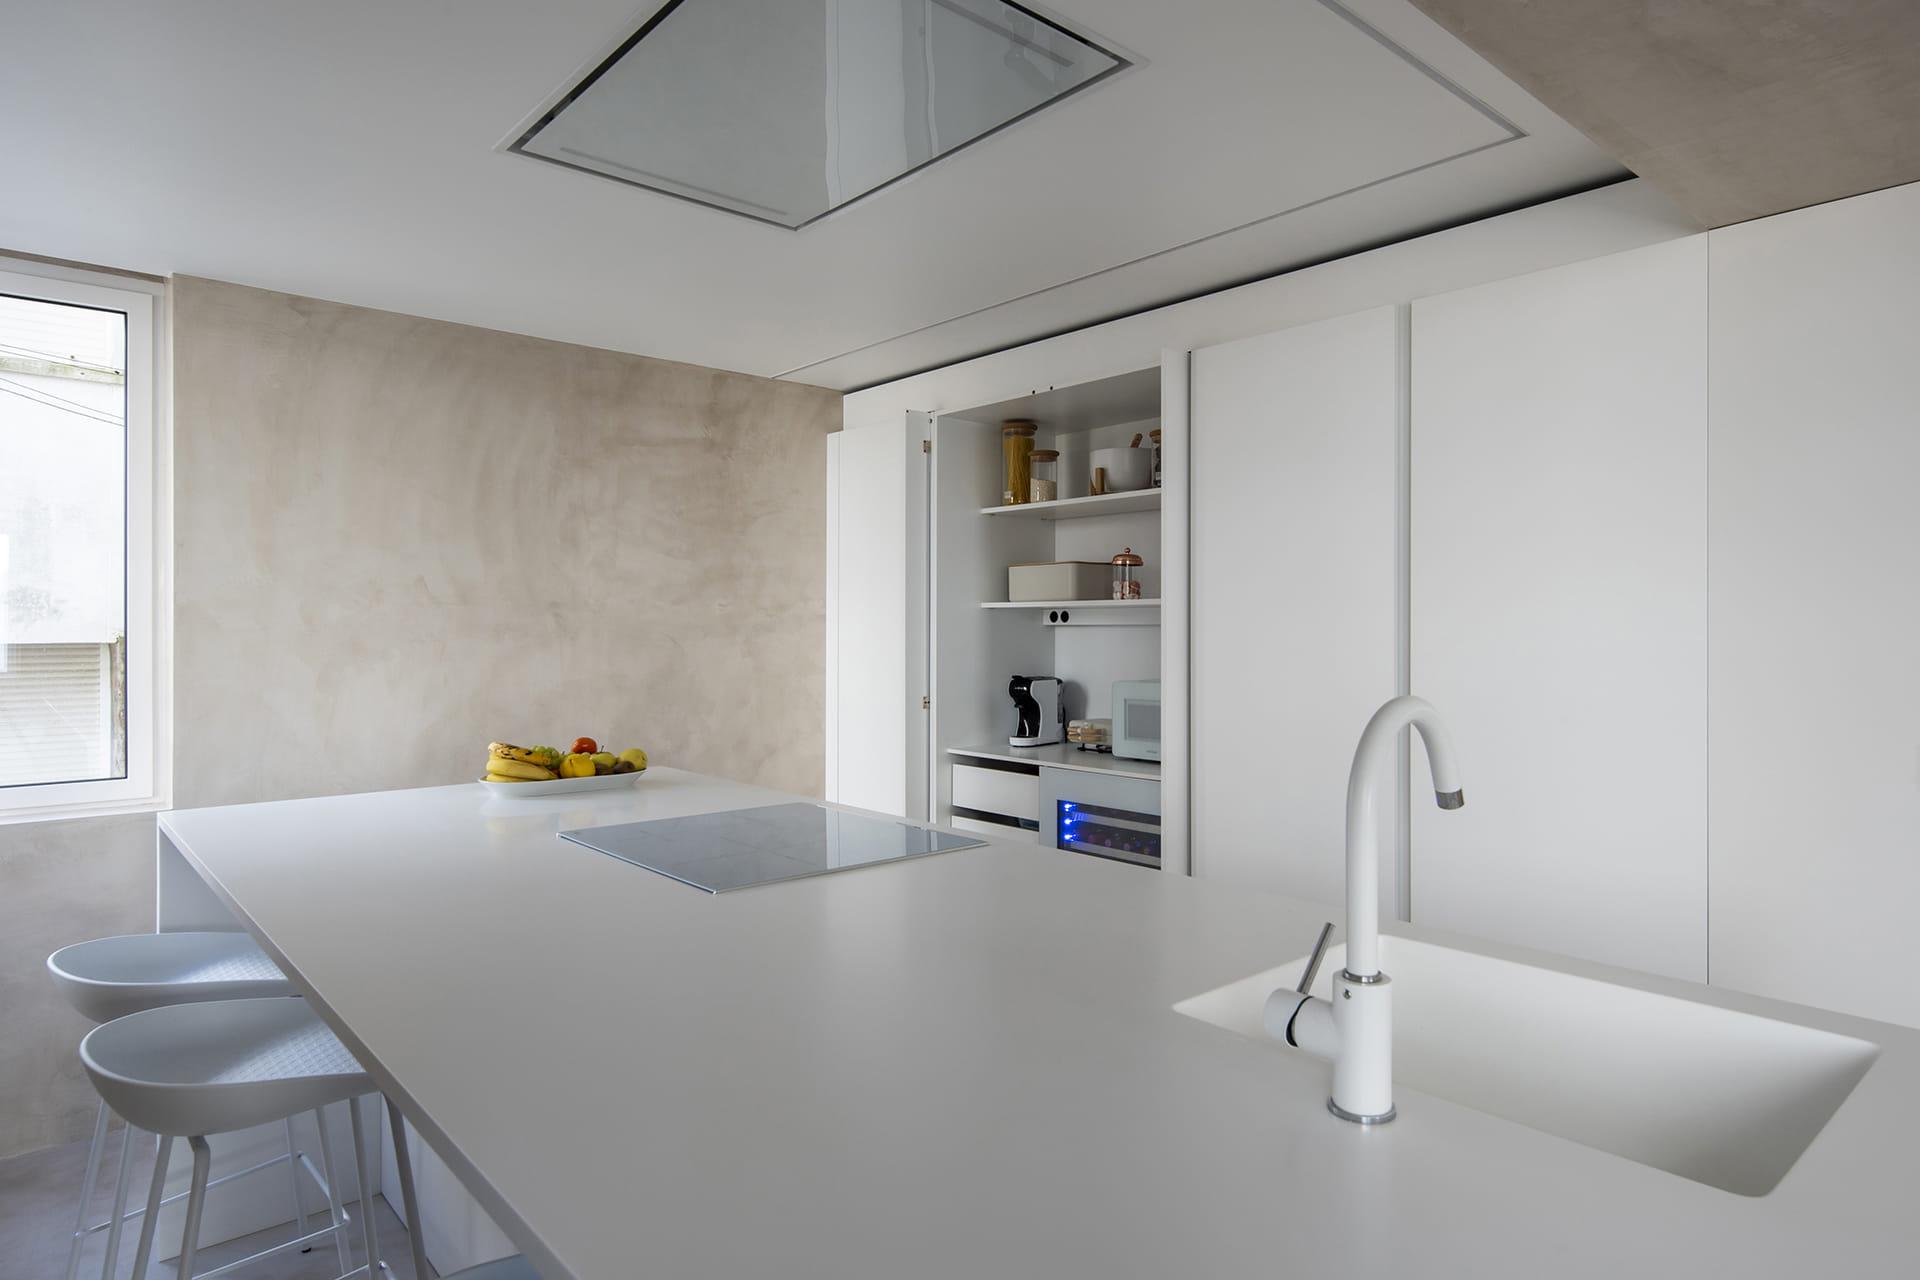 Kolomkast in witte keuken Santos